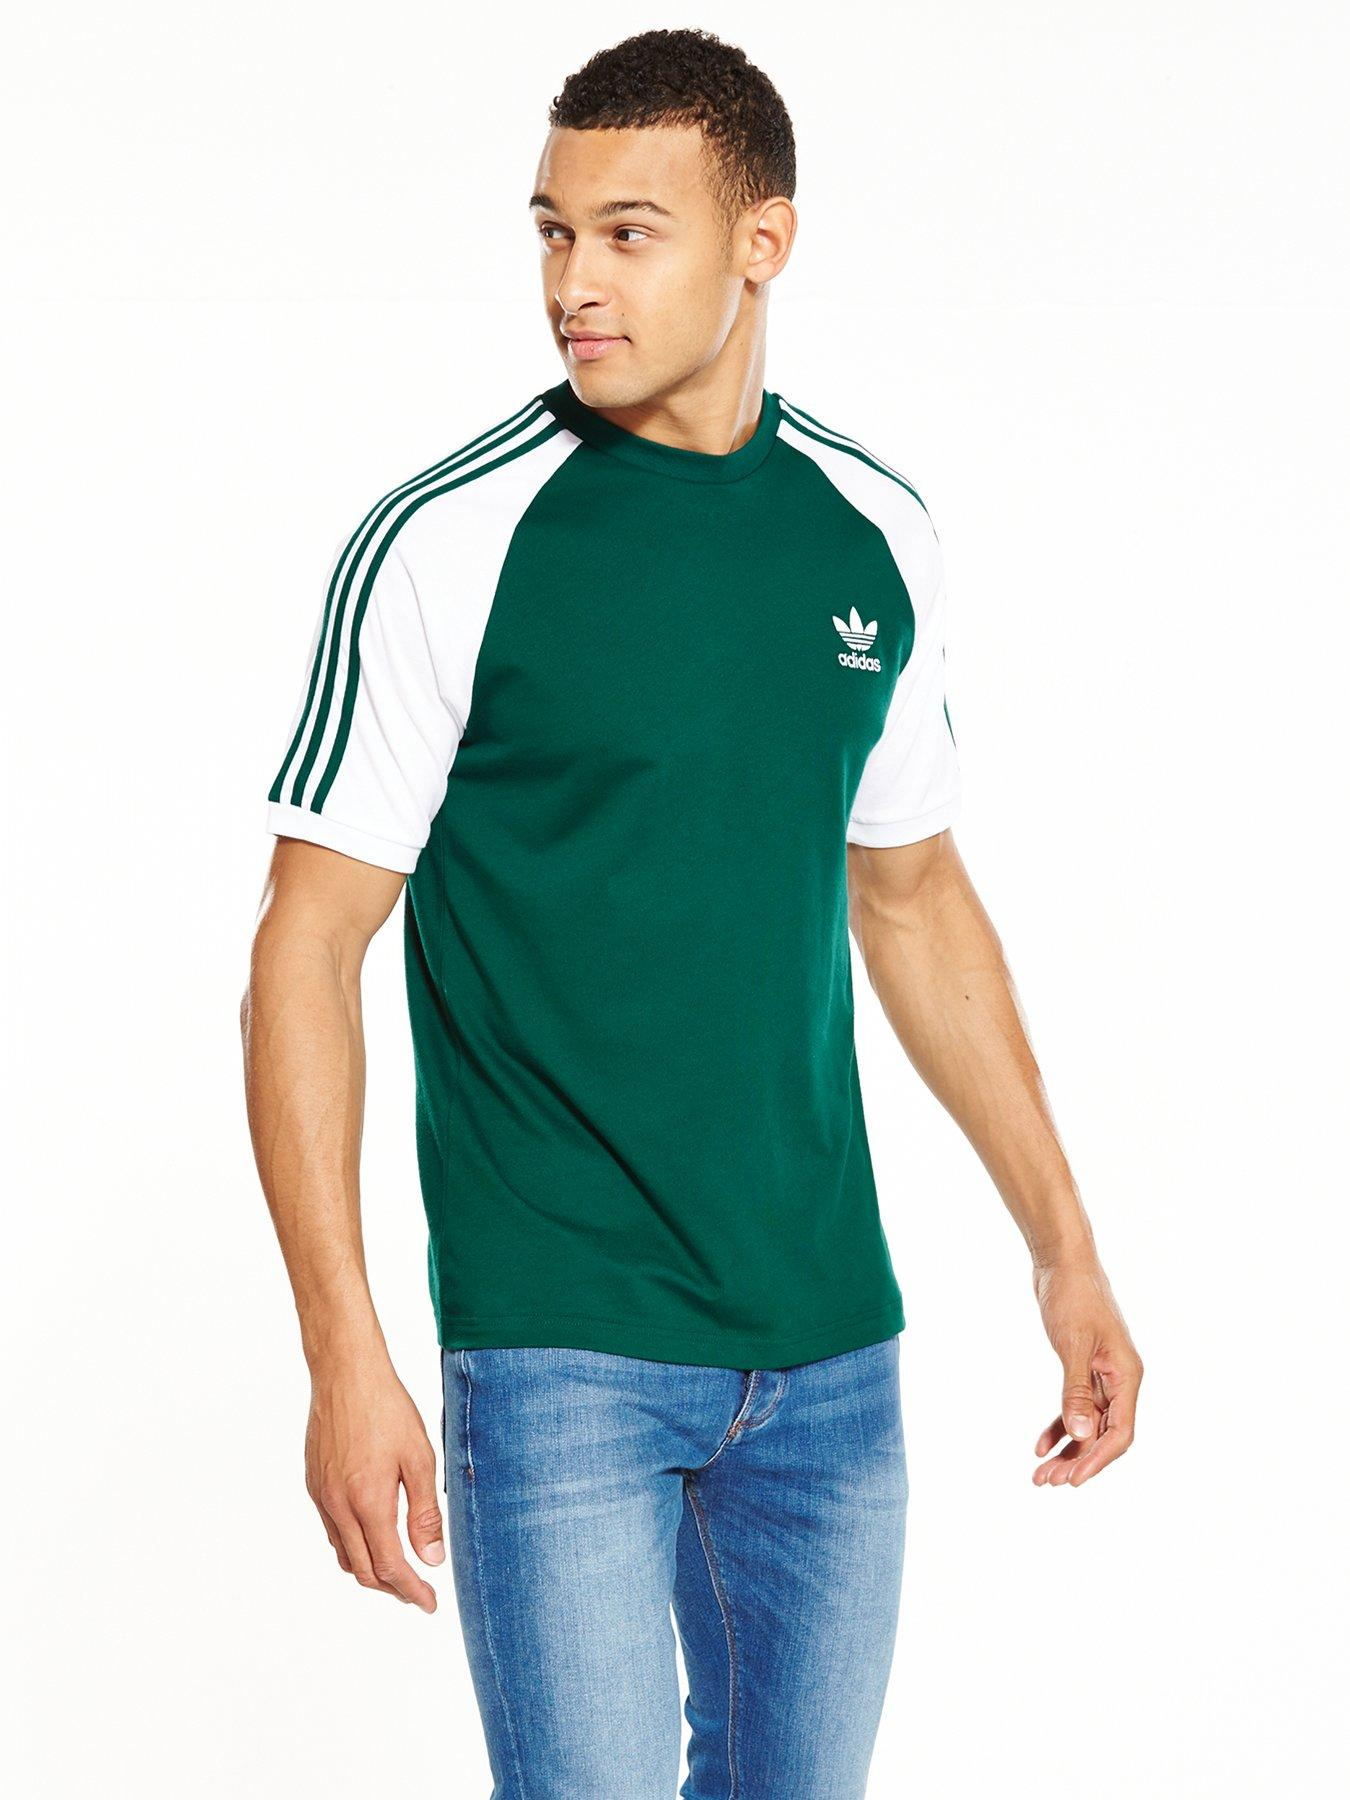 adidas Originals Shirt 3 raya California T Shirt T de adidas <br> Agrega Estilo A Su Móvil! dd86fa7 - immunitetfolie.website